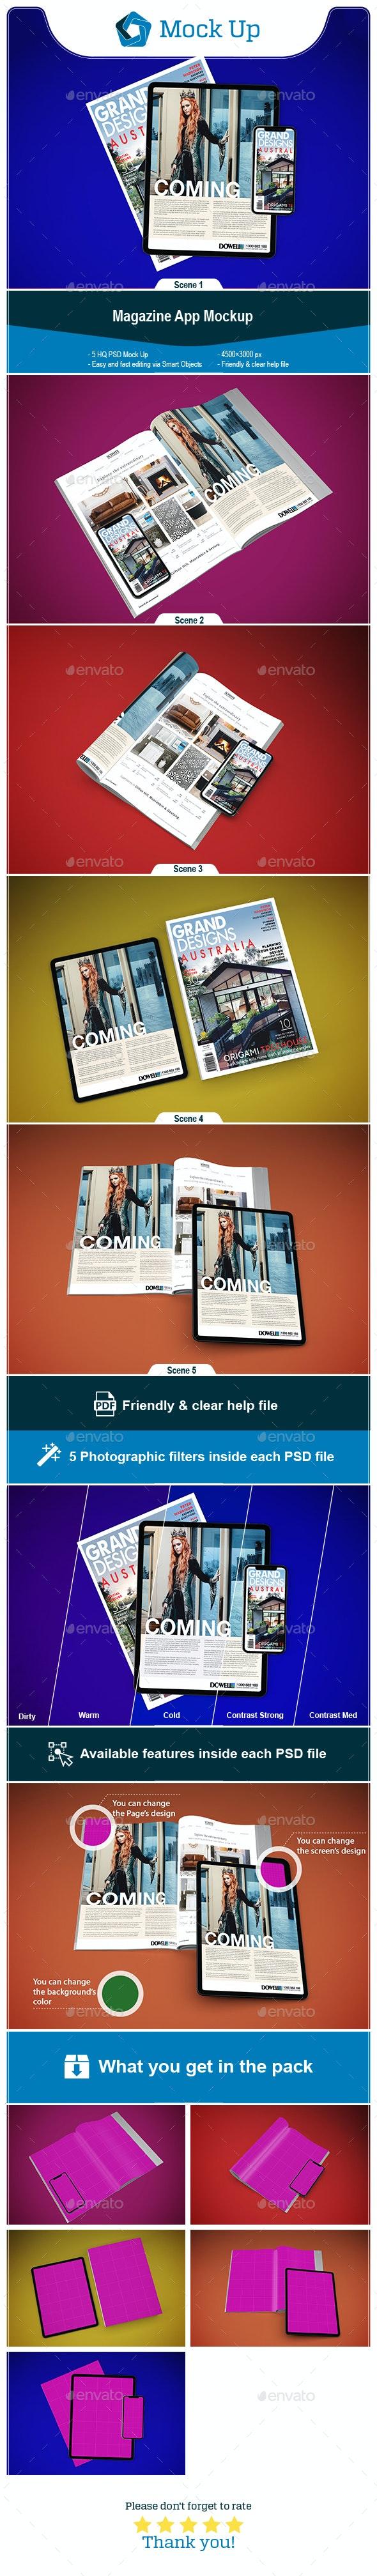 Magazine App Mockup - Mobile Displays